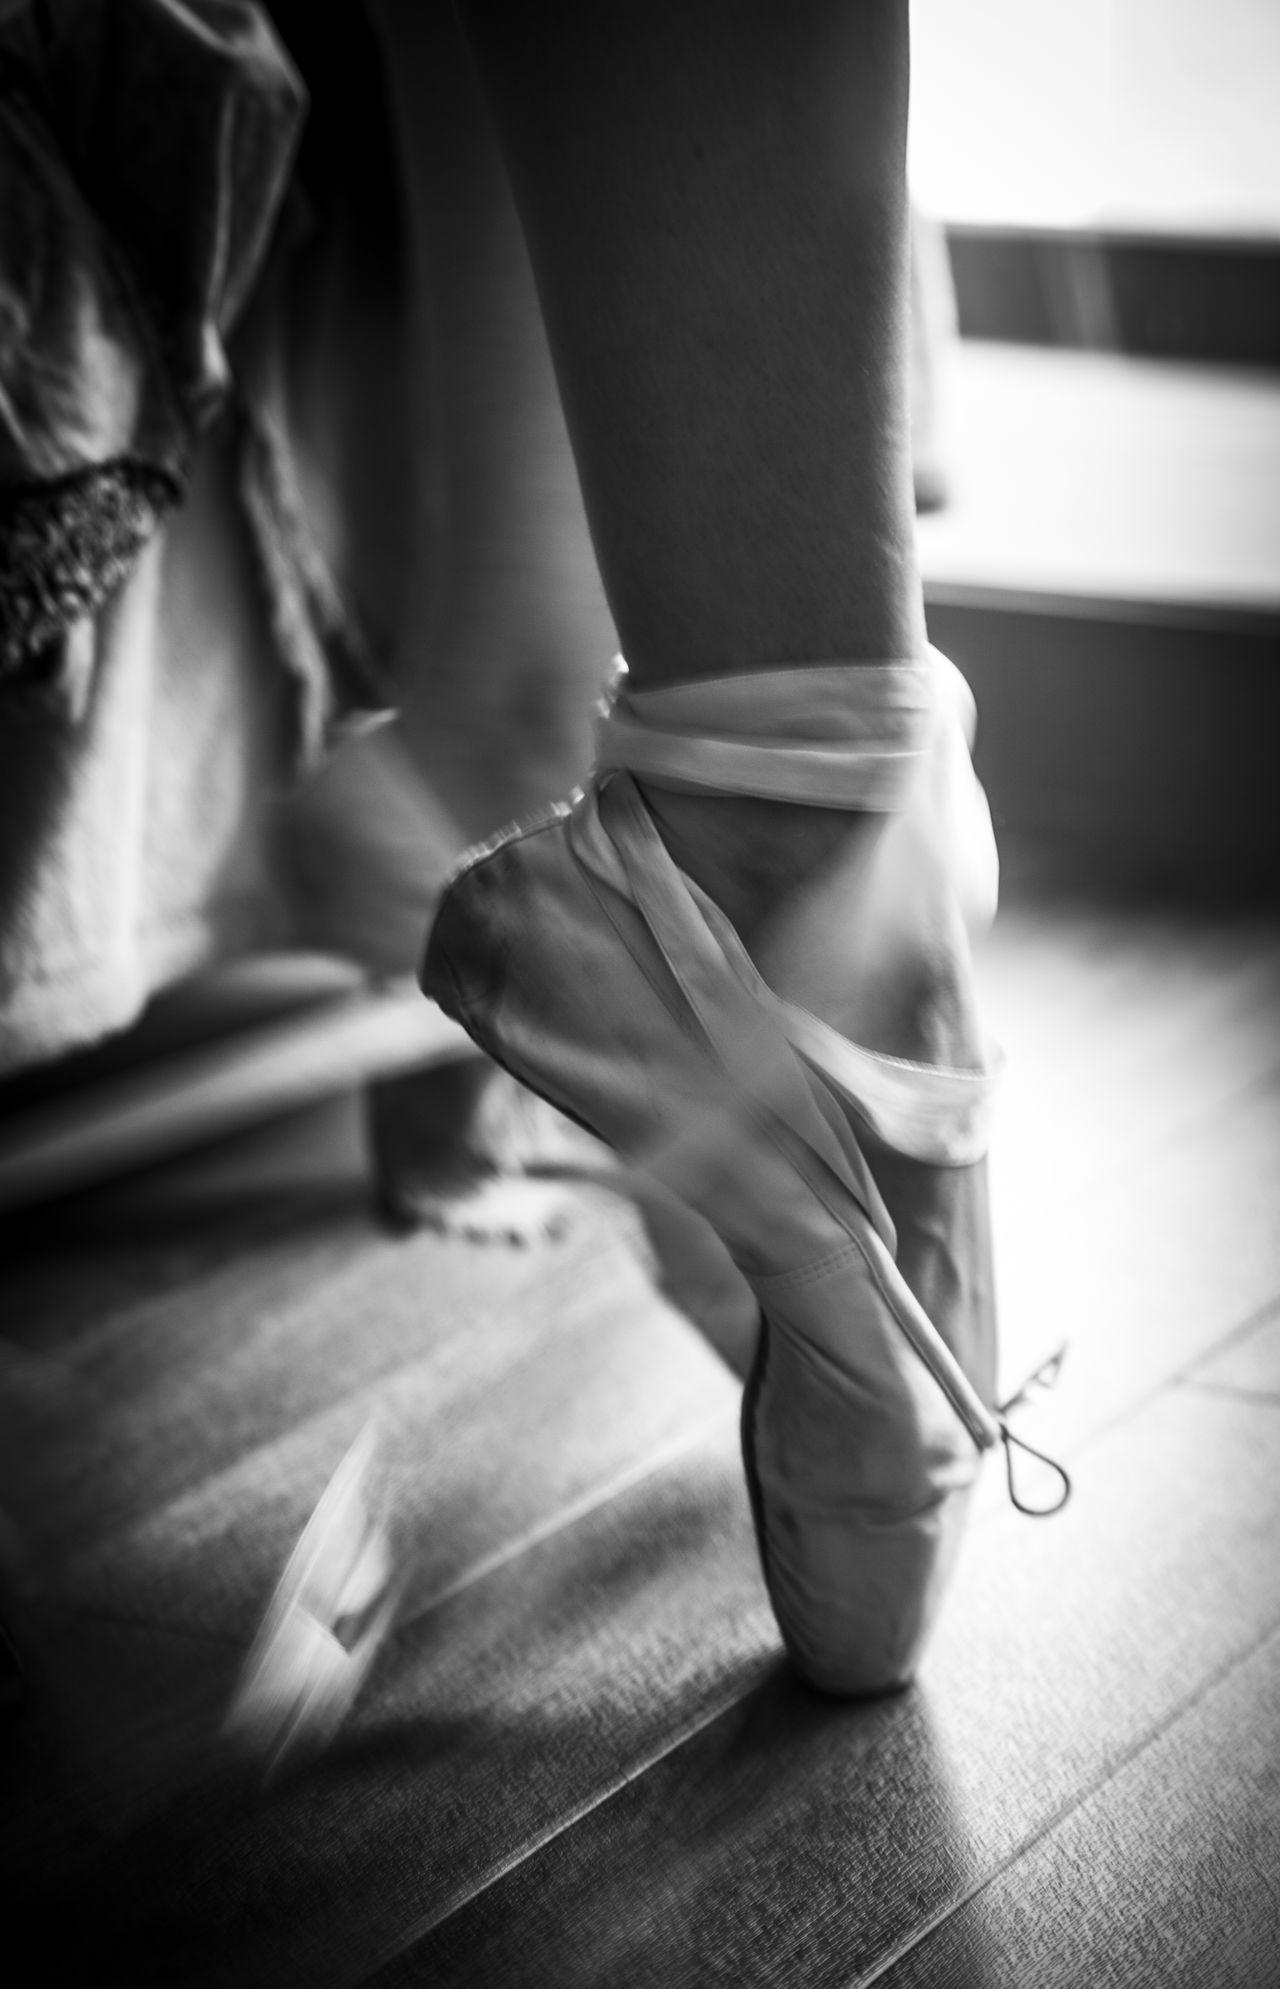 Ballerina Ballet Ballet Dancer Ballet Shoes Close-up Dance Photography Dancer Human Foot Movement Pointe  Pointe Shoes Rehersal Ribbon Women